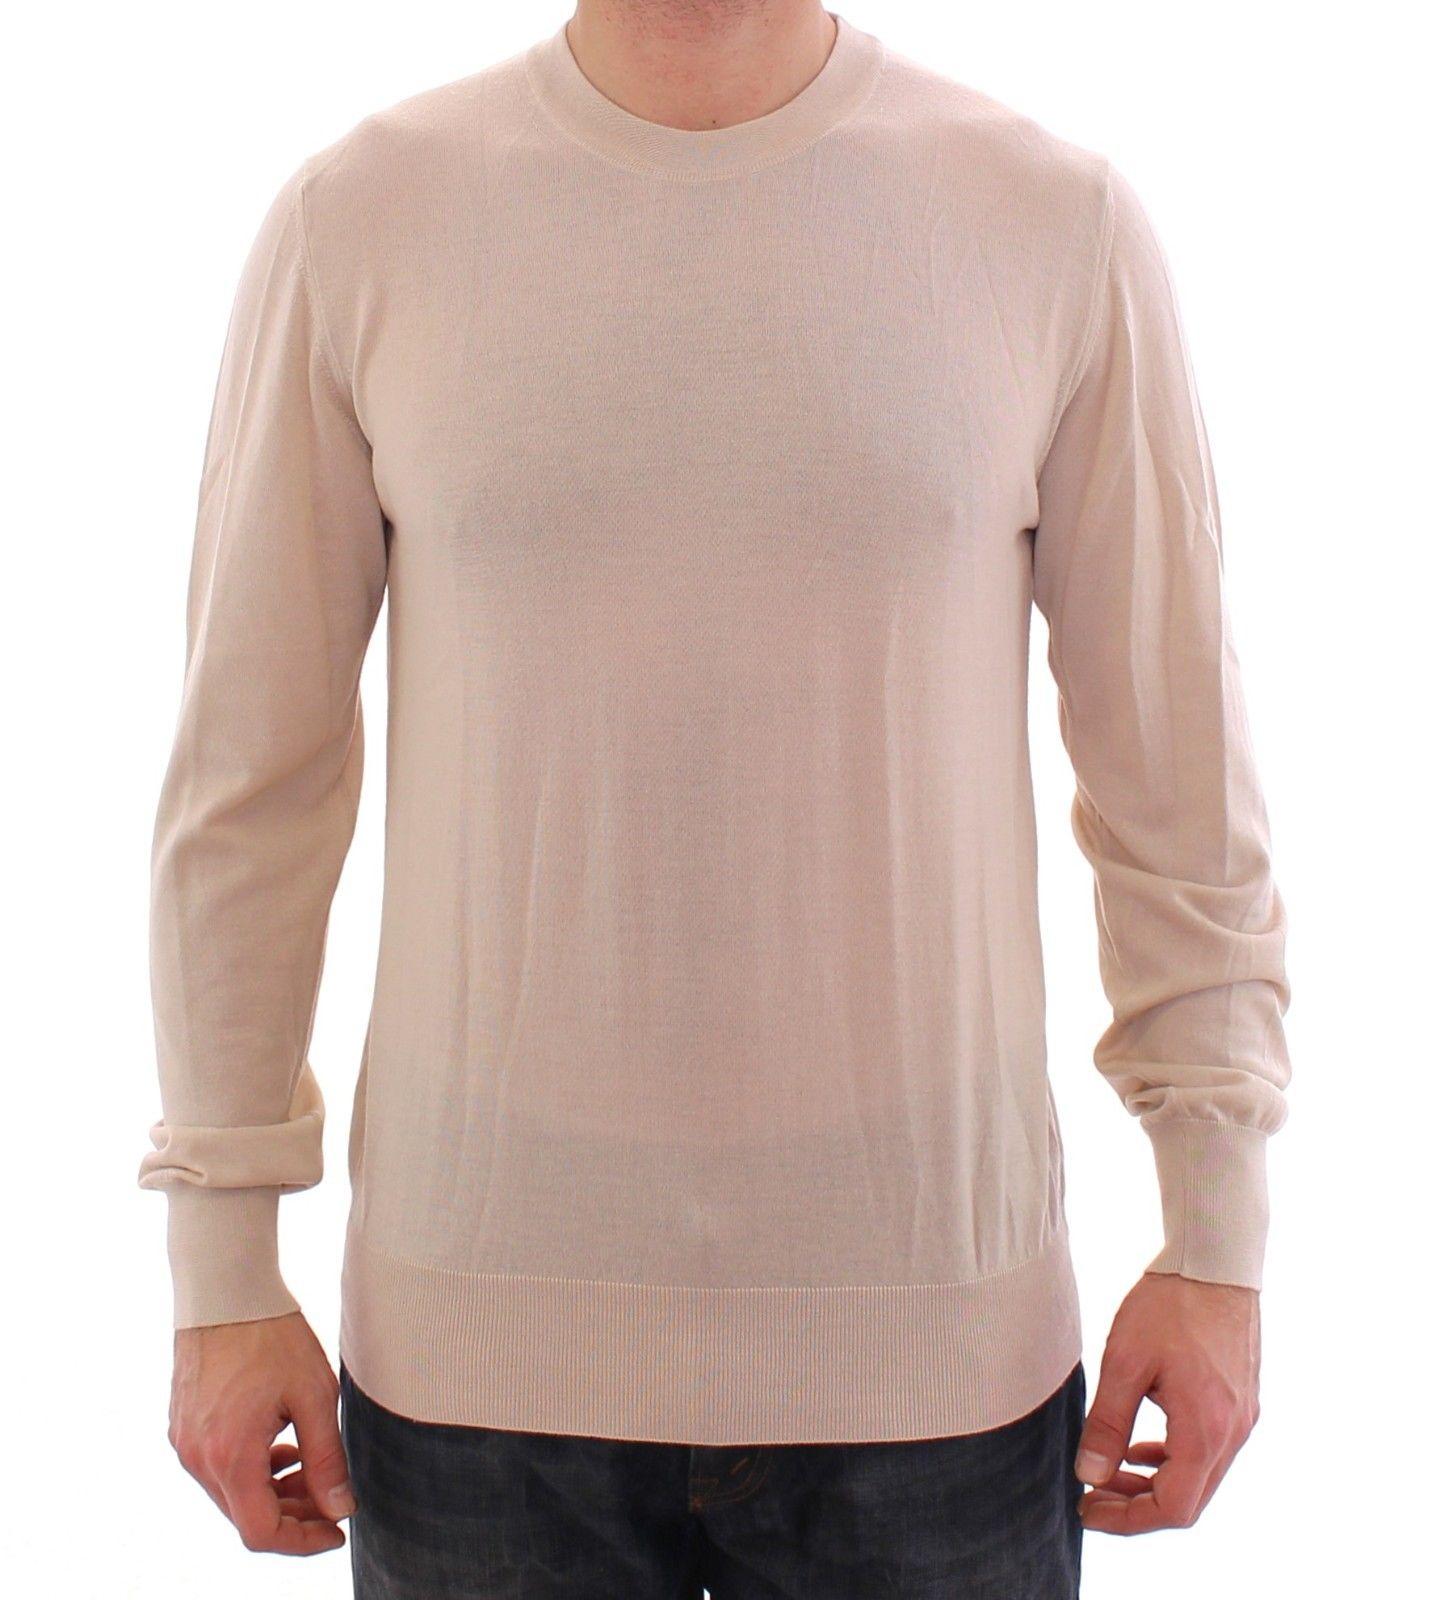 Dolce & Gabbana Men's Cashmere Crew-neck Sweater Beige GSS15035 - IT44 | XS